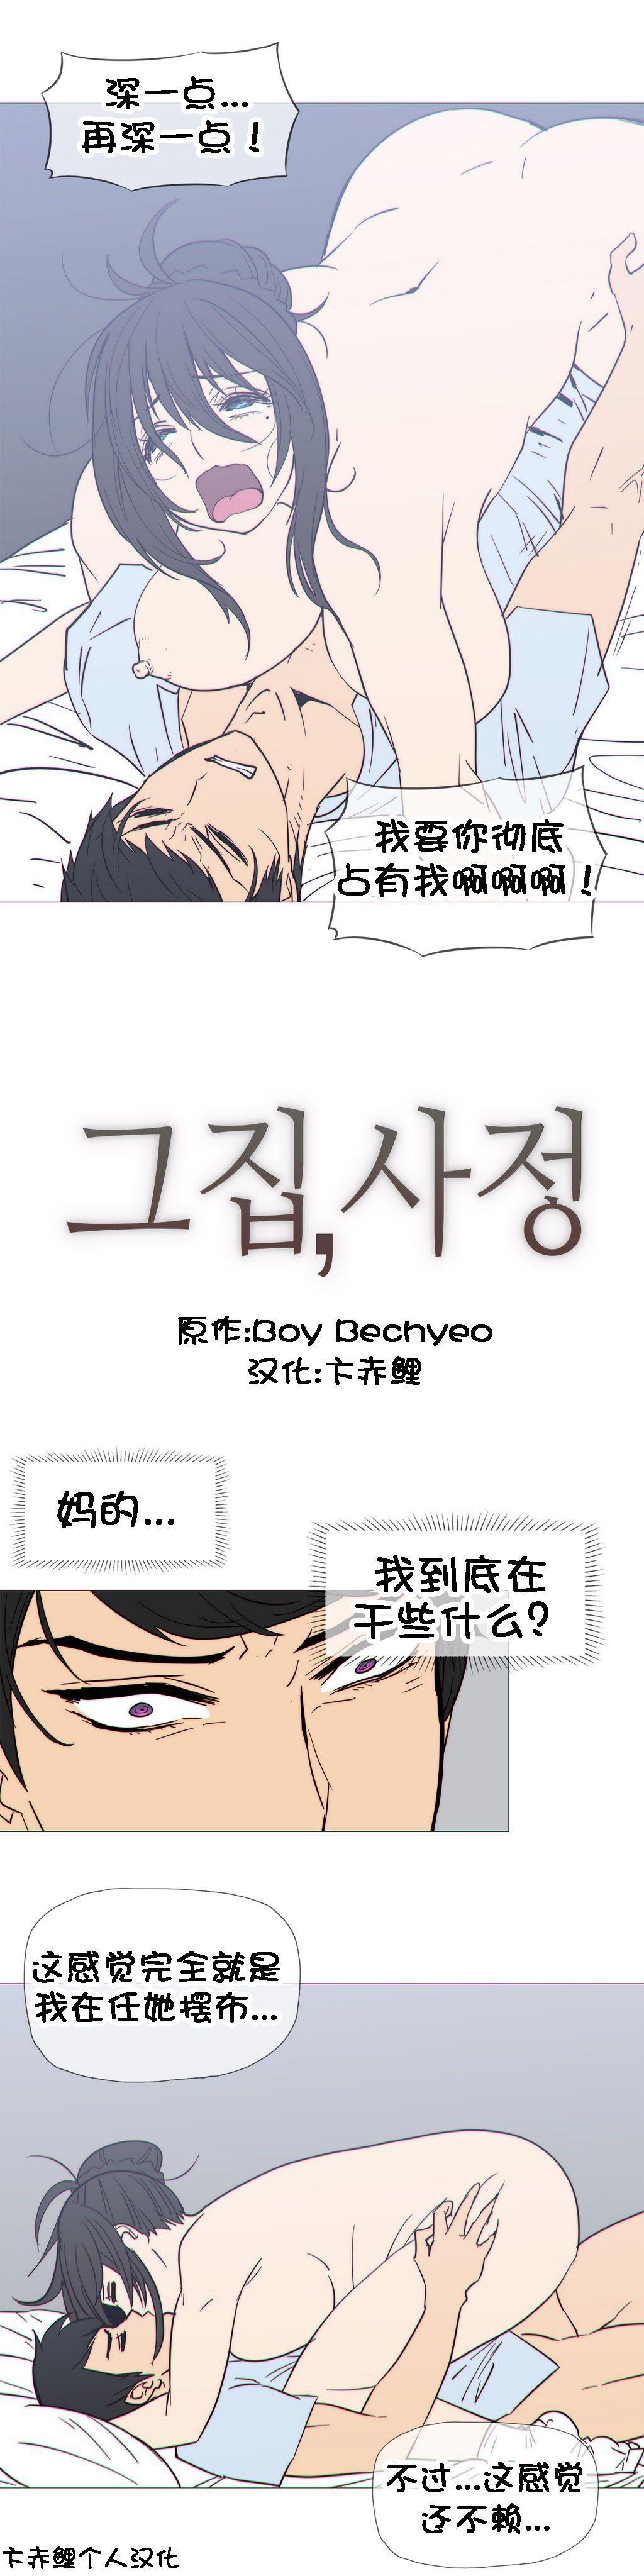 HouseHold Affairs 【卞赤鲤个人汉化】1~33话(持续更新中) 524